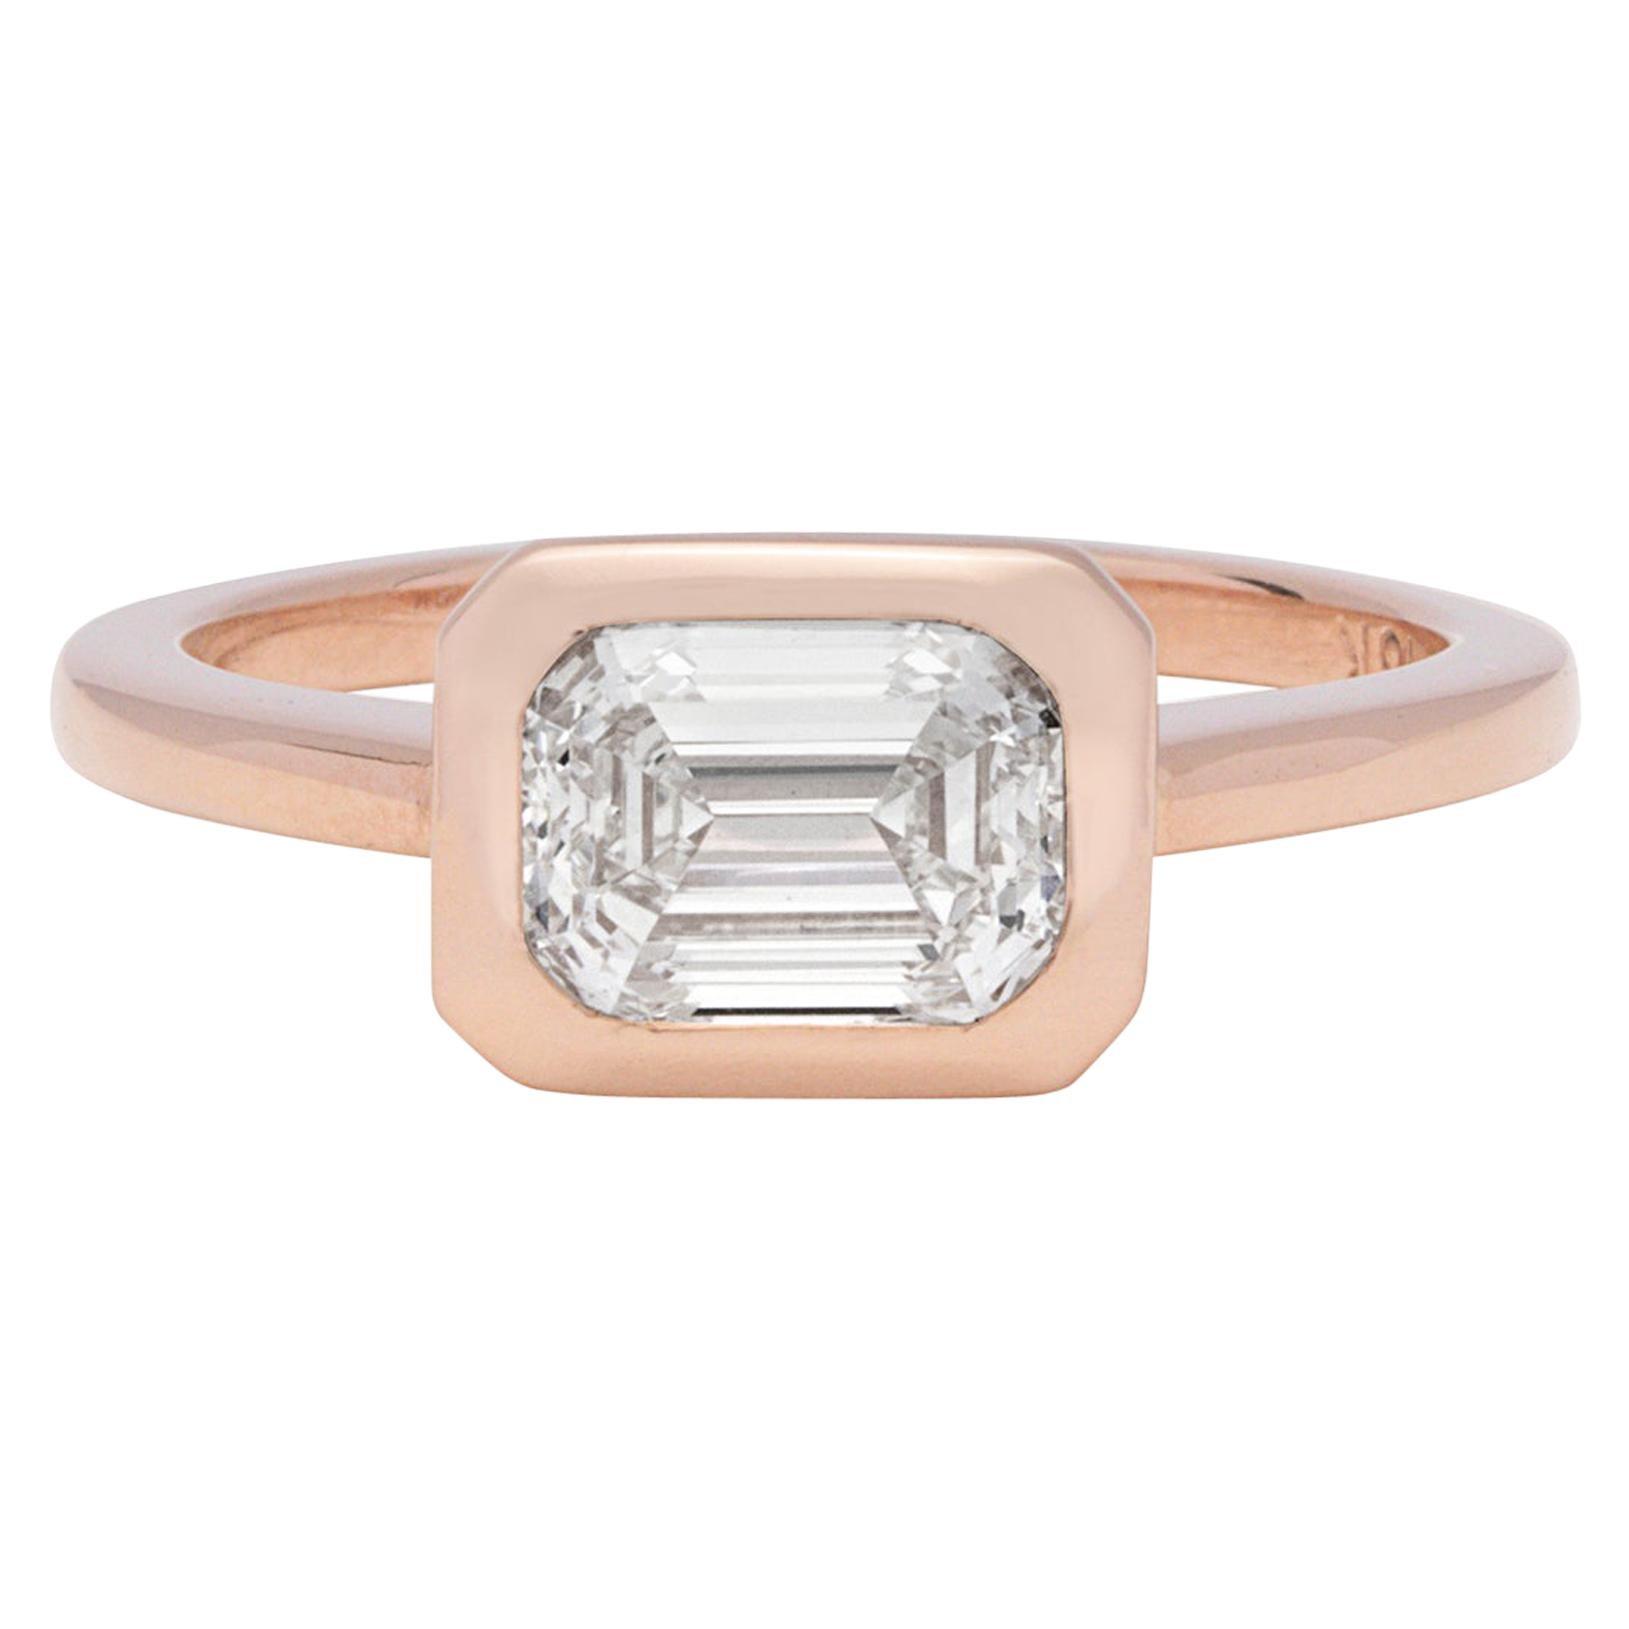 GIA 1.20 Carat I/VS1 Emerald Cut Engagement Ring